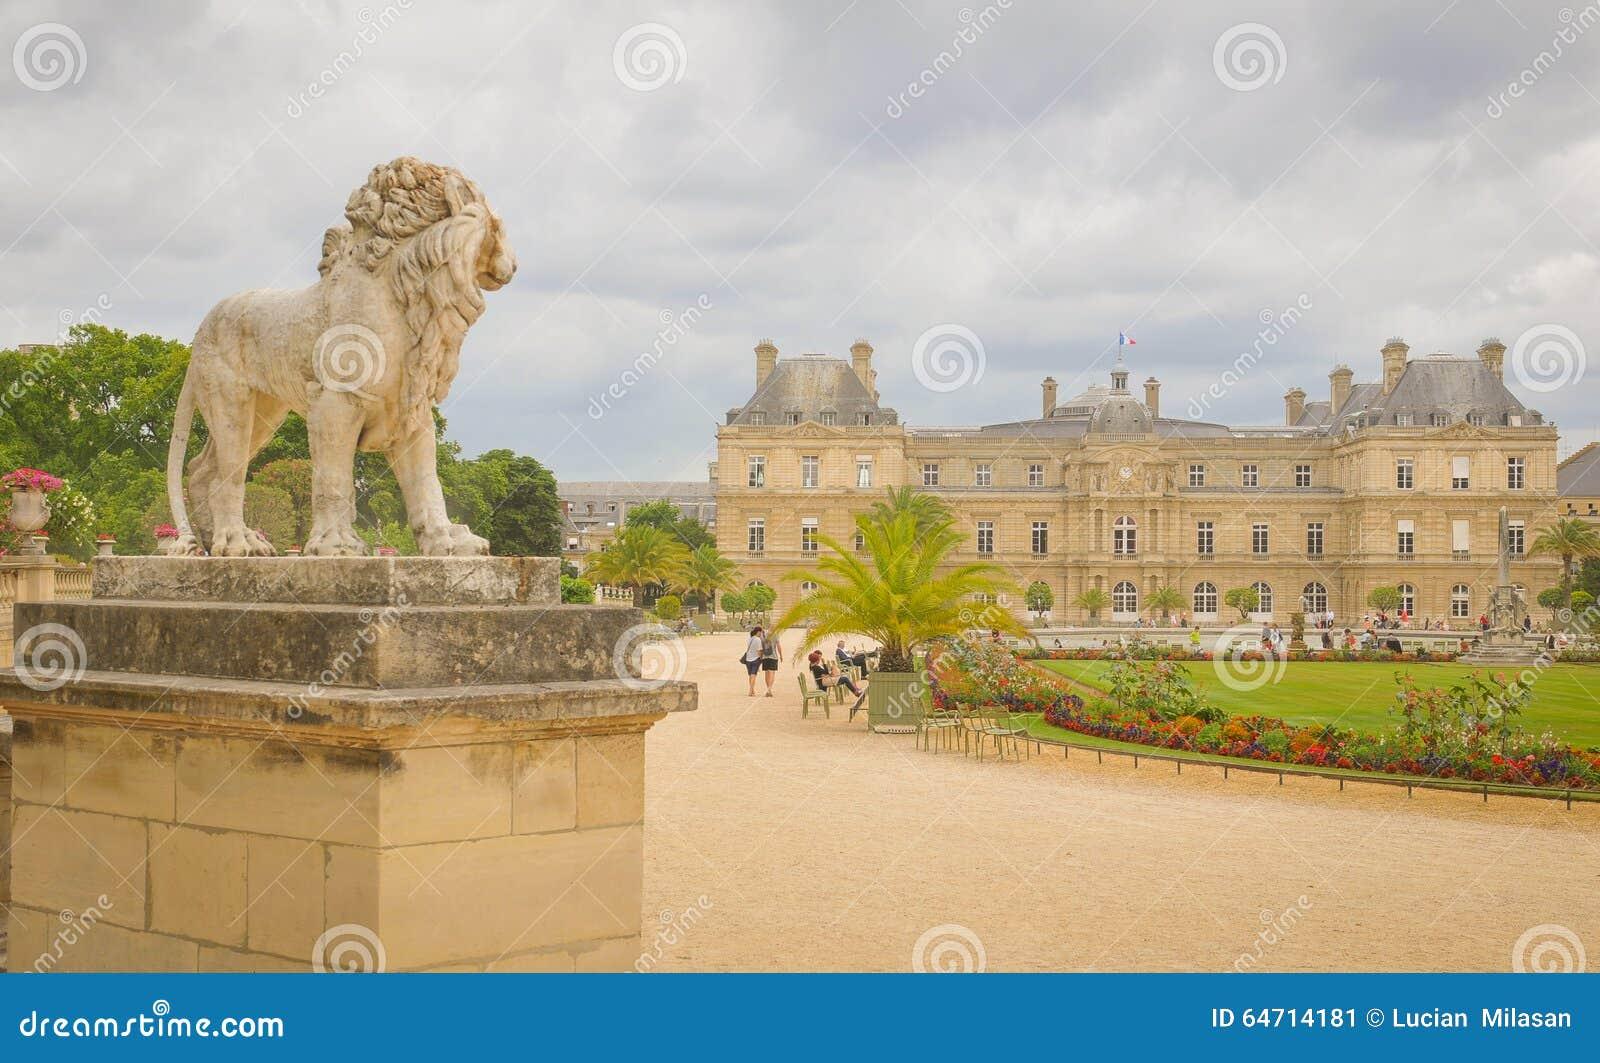 Luxembourg Garden (Jardin du Luxembourg) in Paris, France